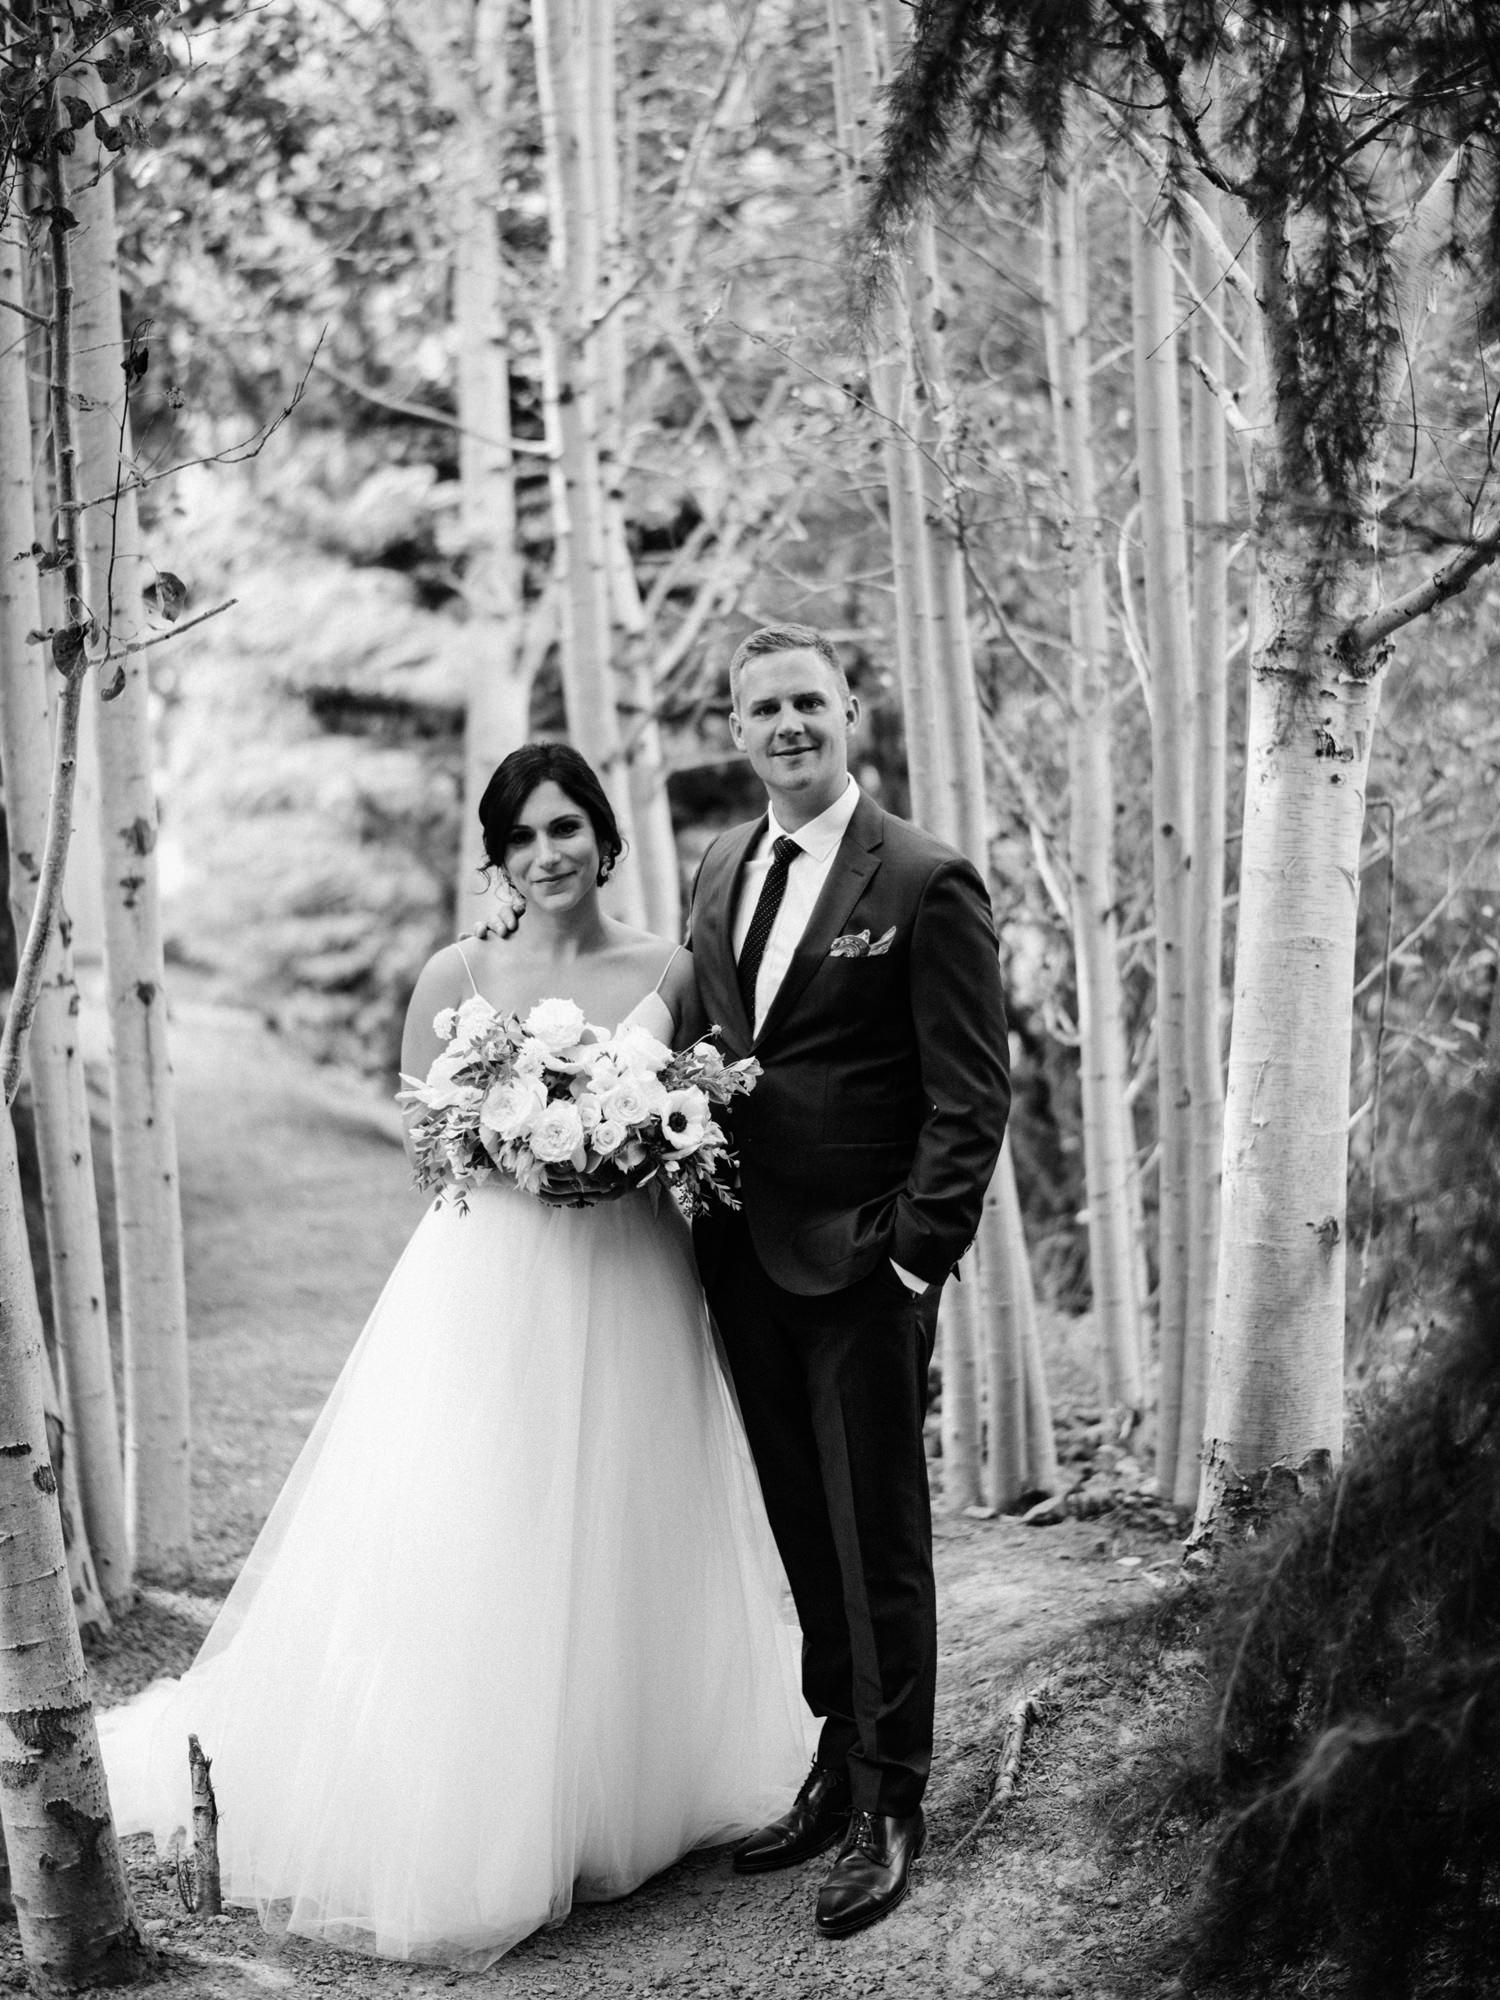 123-woodland-farm-meadow-wedding-by-best-seattle-film-photographer.jpg